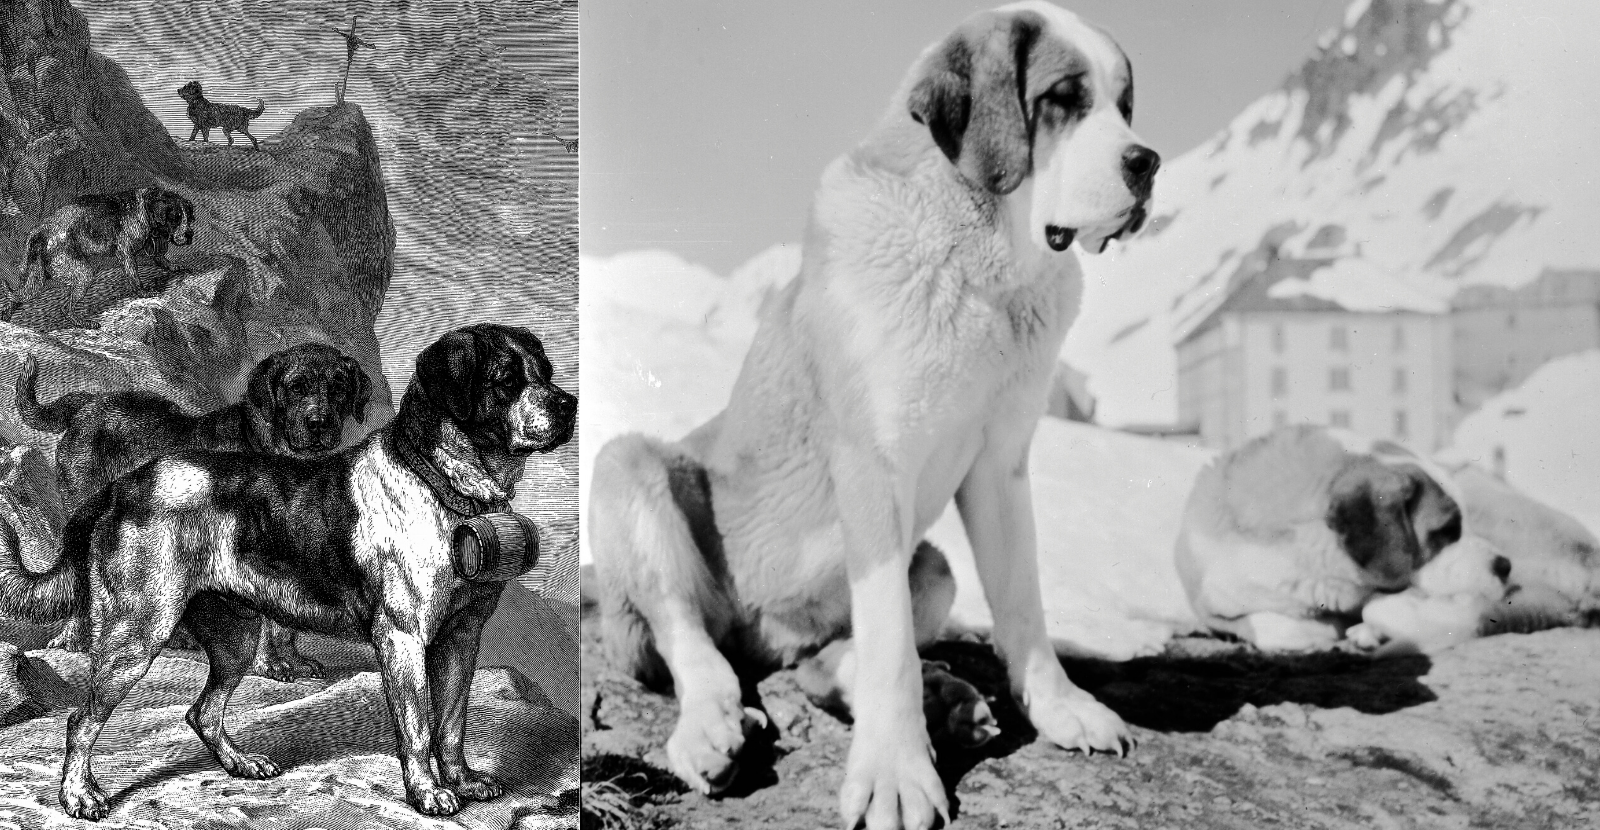 Historic images of Saint Bernard